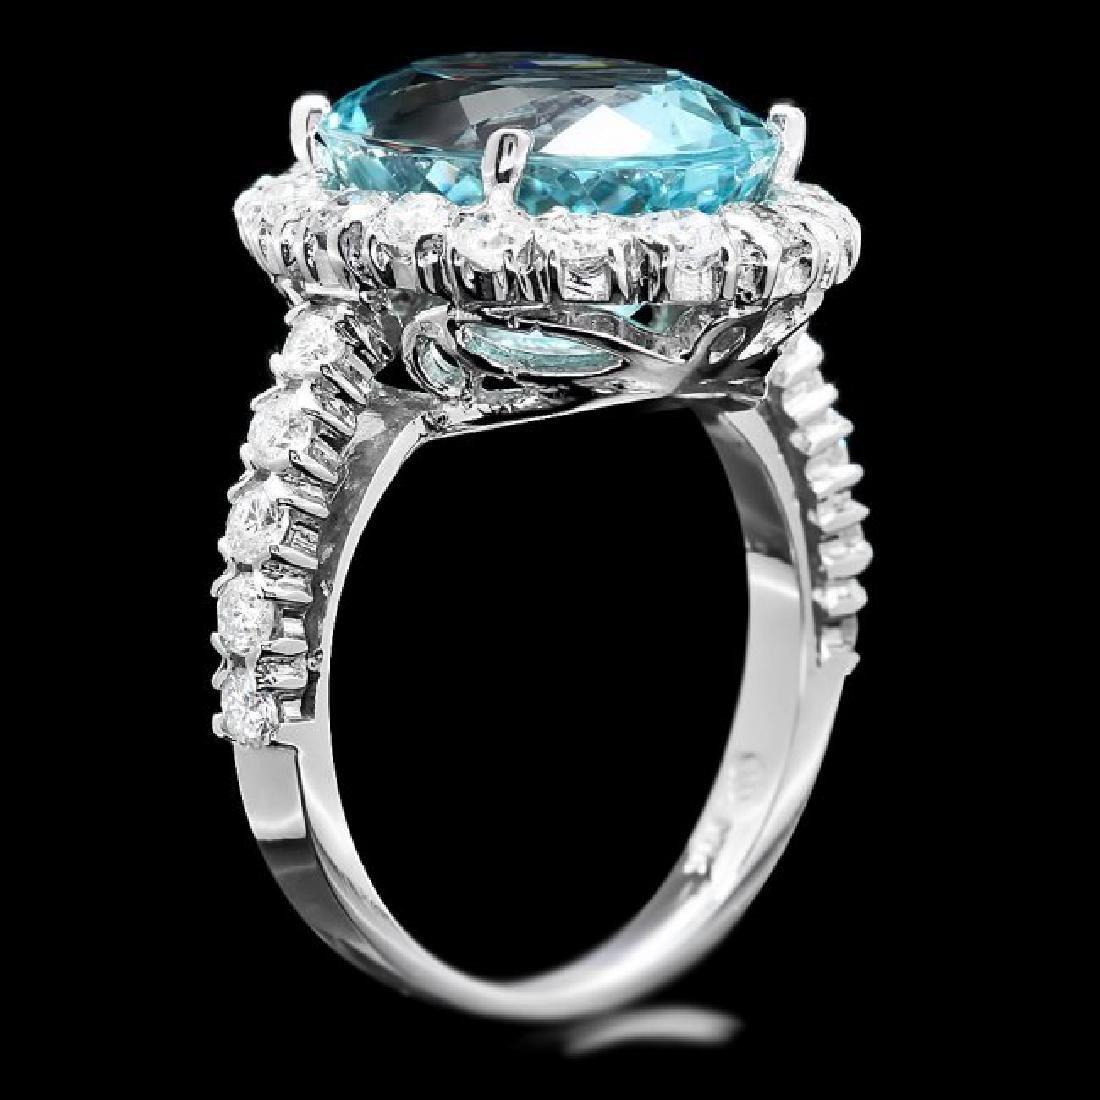 14k Gold 7.50ct Aquamarine 1.55ct Diamond Ring - 3